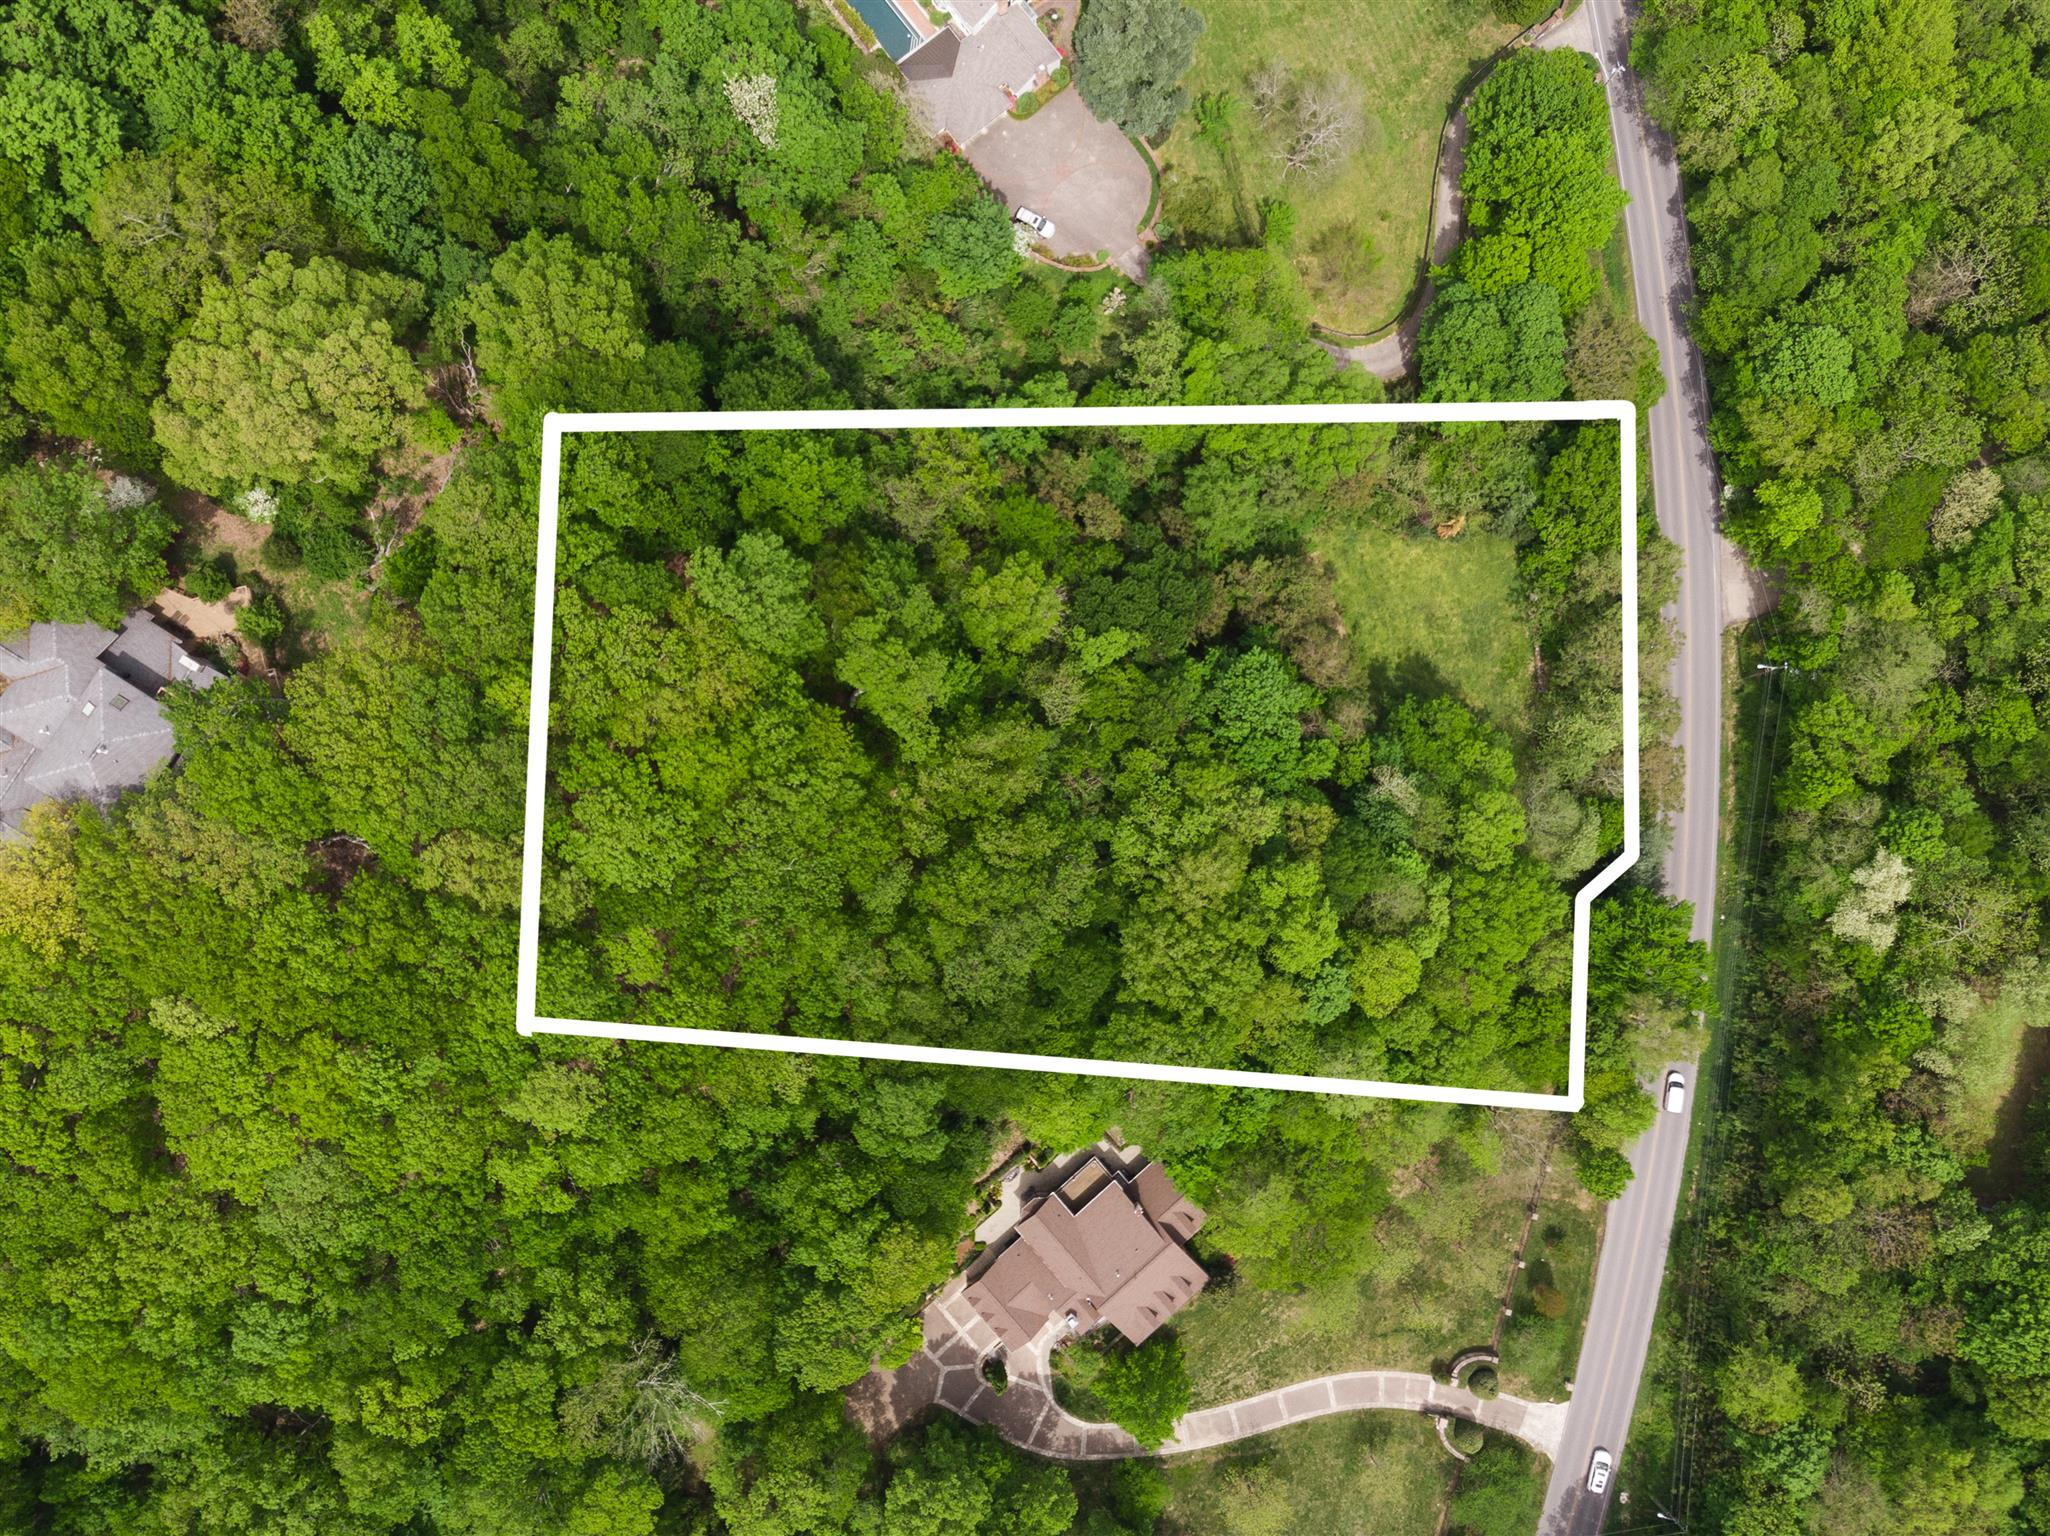 1706 Tyne Blvd, Nashville, TN 37215 - Nashville, TN real estate listing